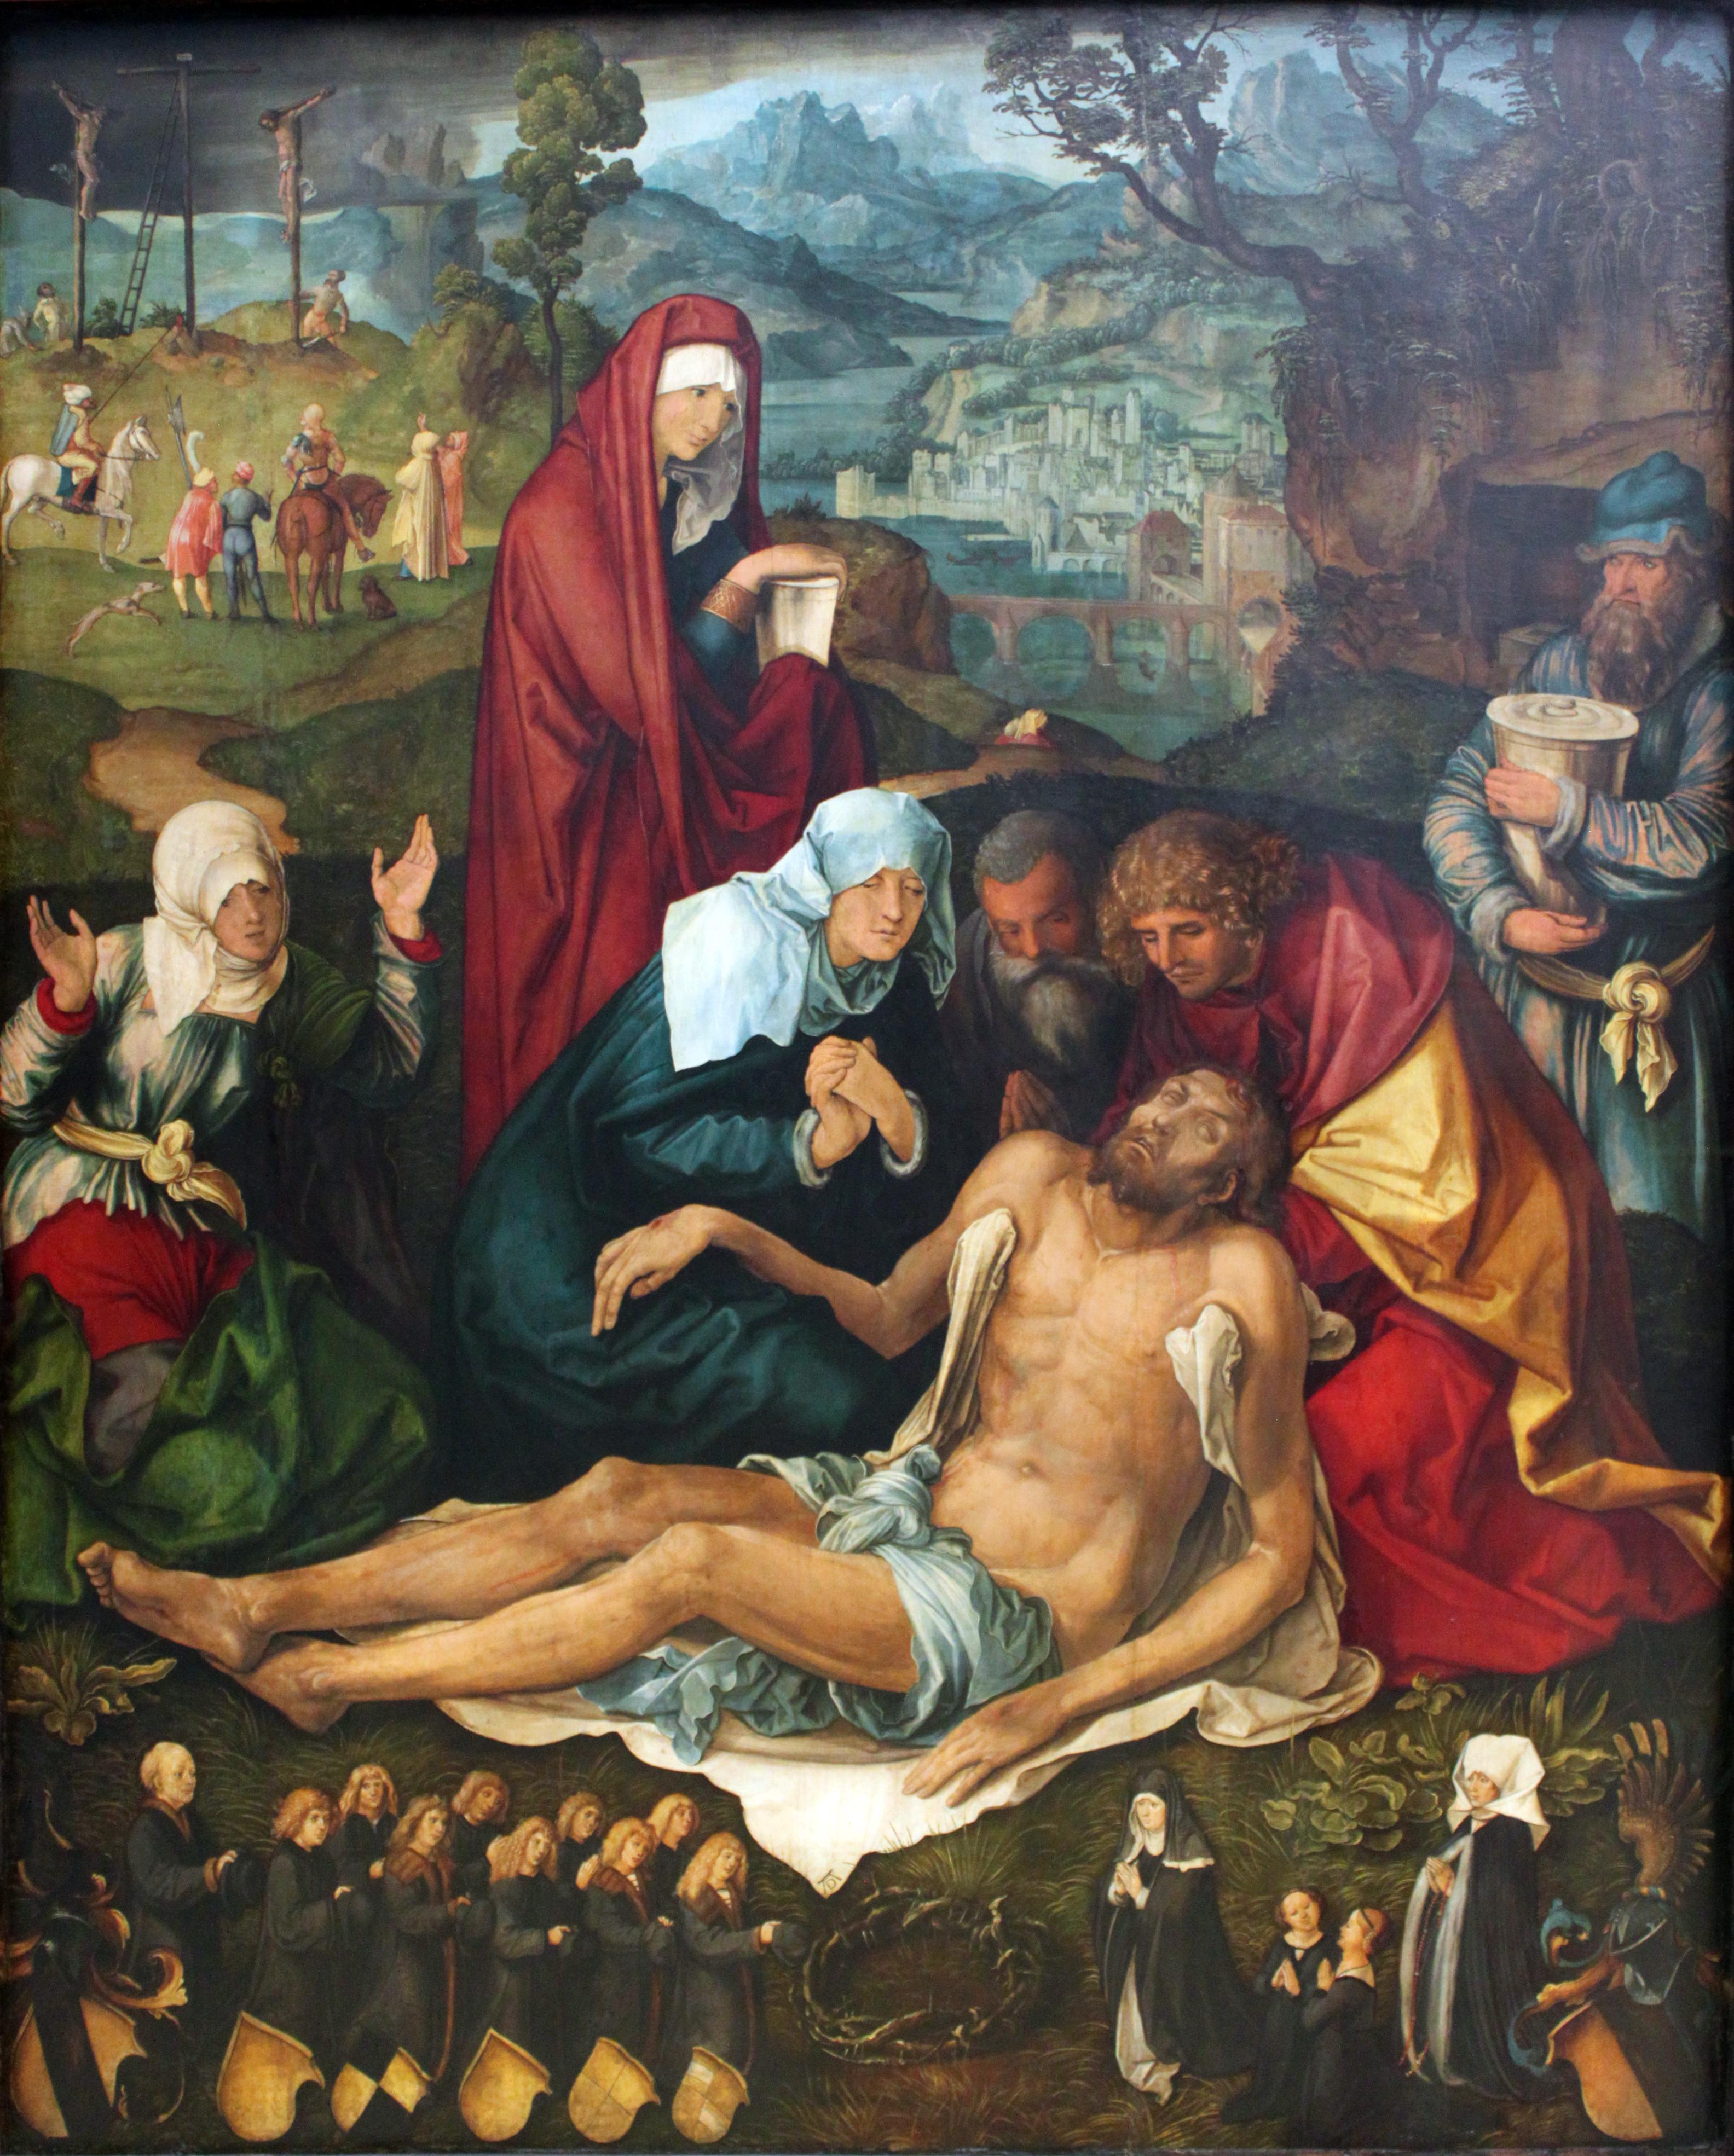 File:1499 Dürer Beweinung Christi anagoria.JPG